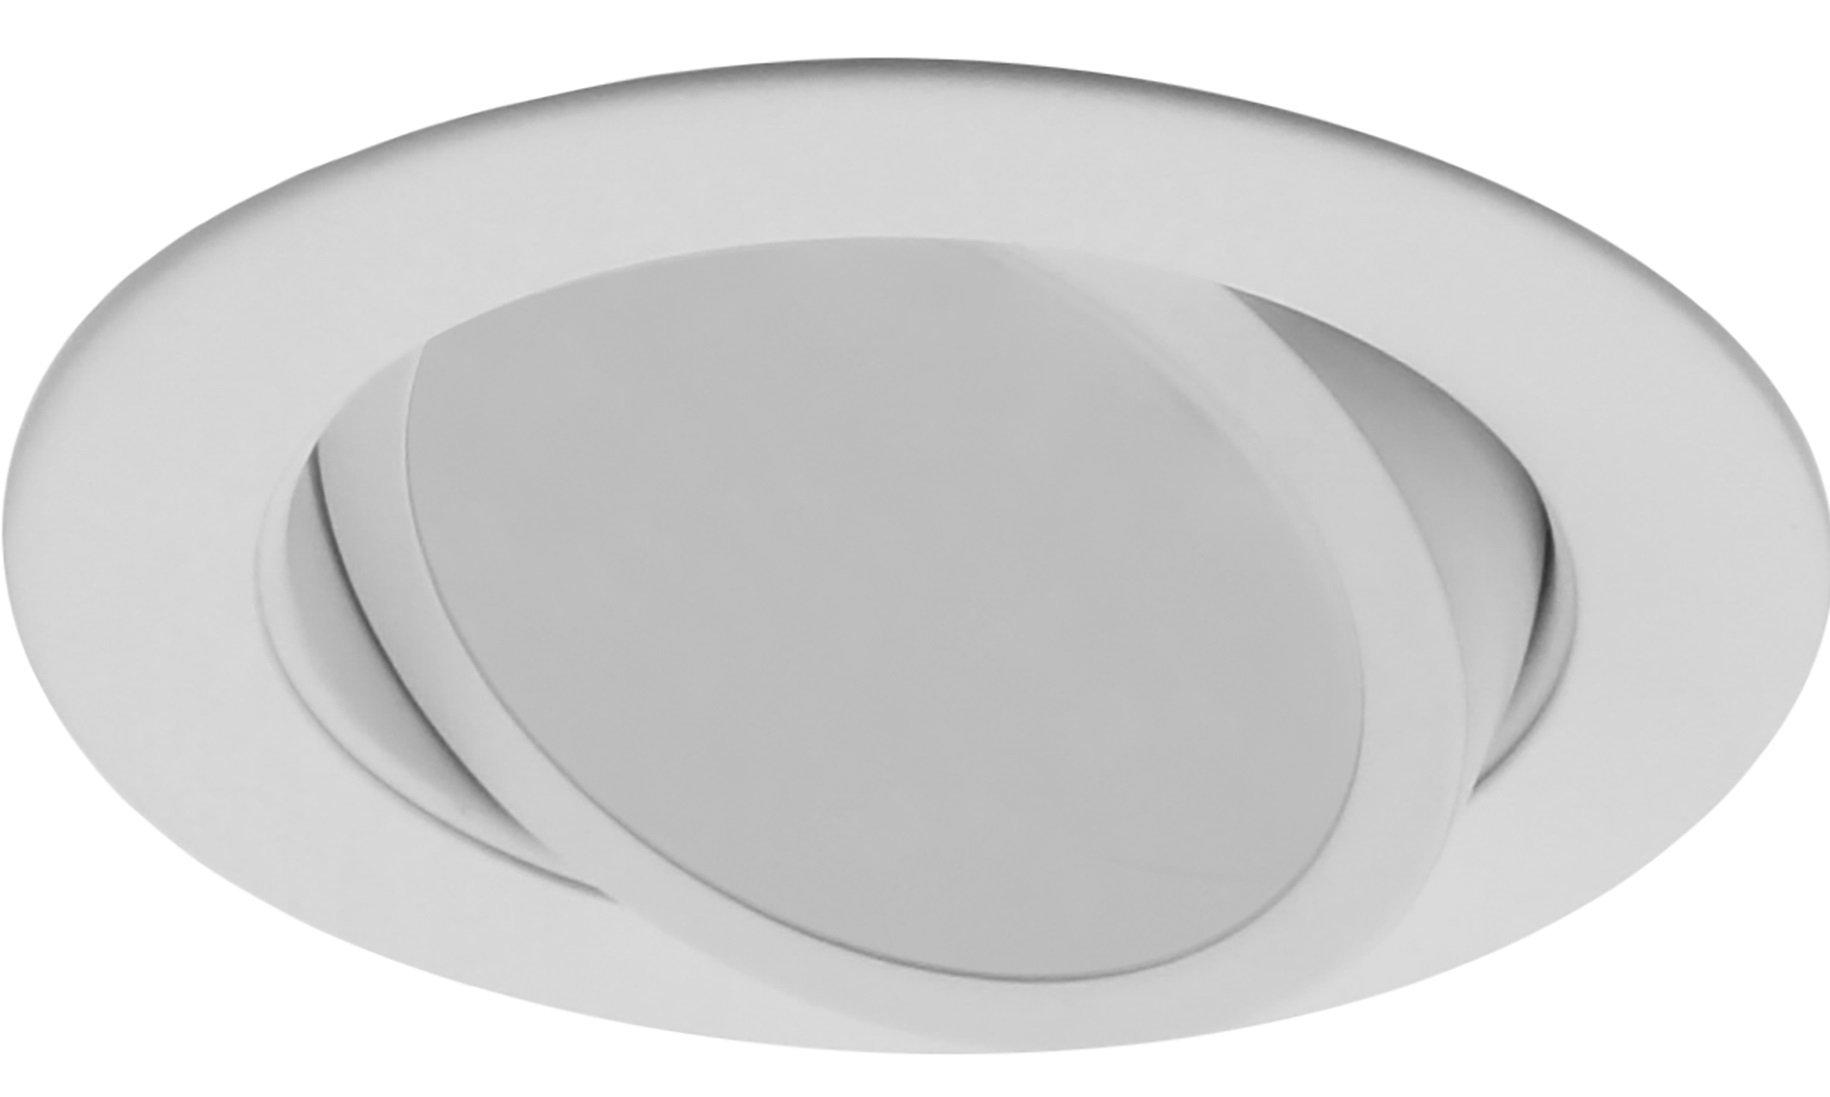 NICOR Lighting 4-Inch Dimmable 4000K LED Gimbal Recessed Downlight, White (DLG4-10-120-4K-WH) by NICOR Lighting